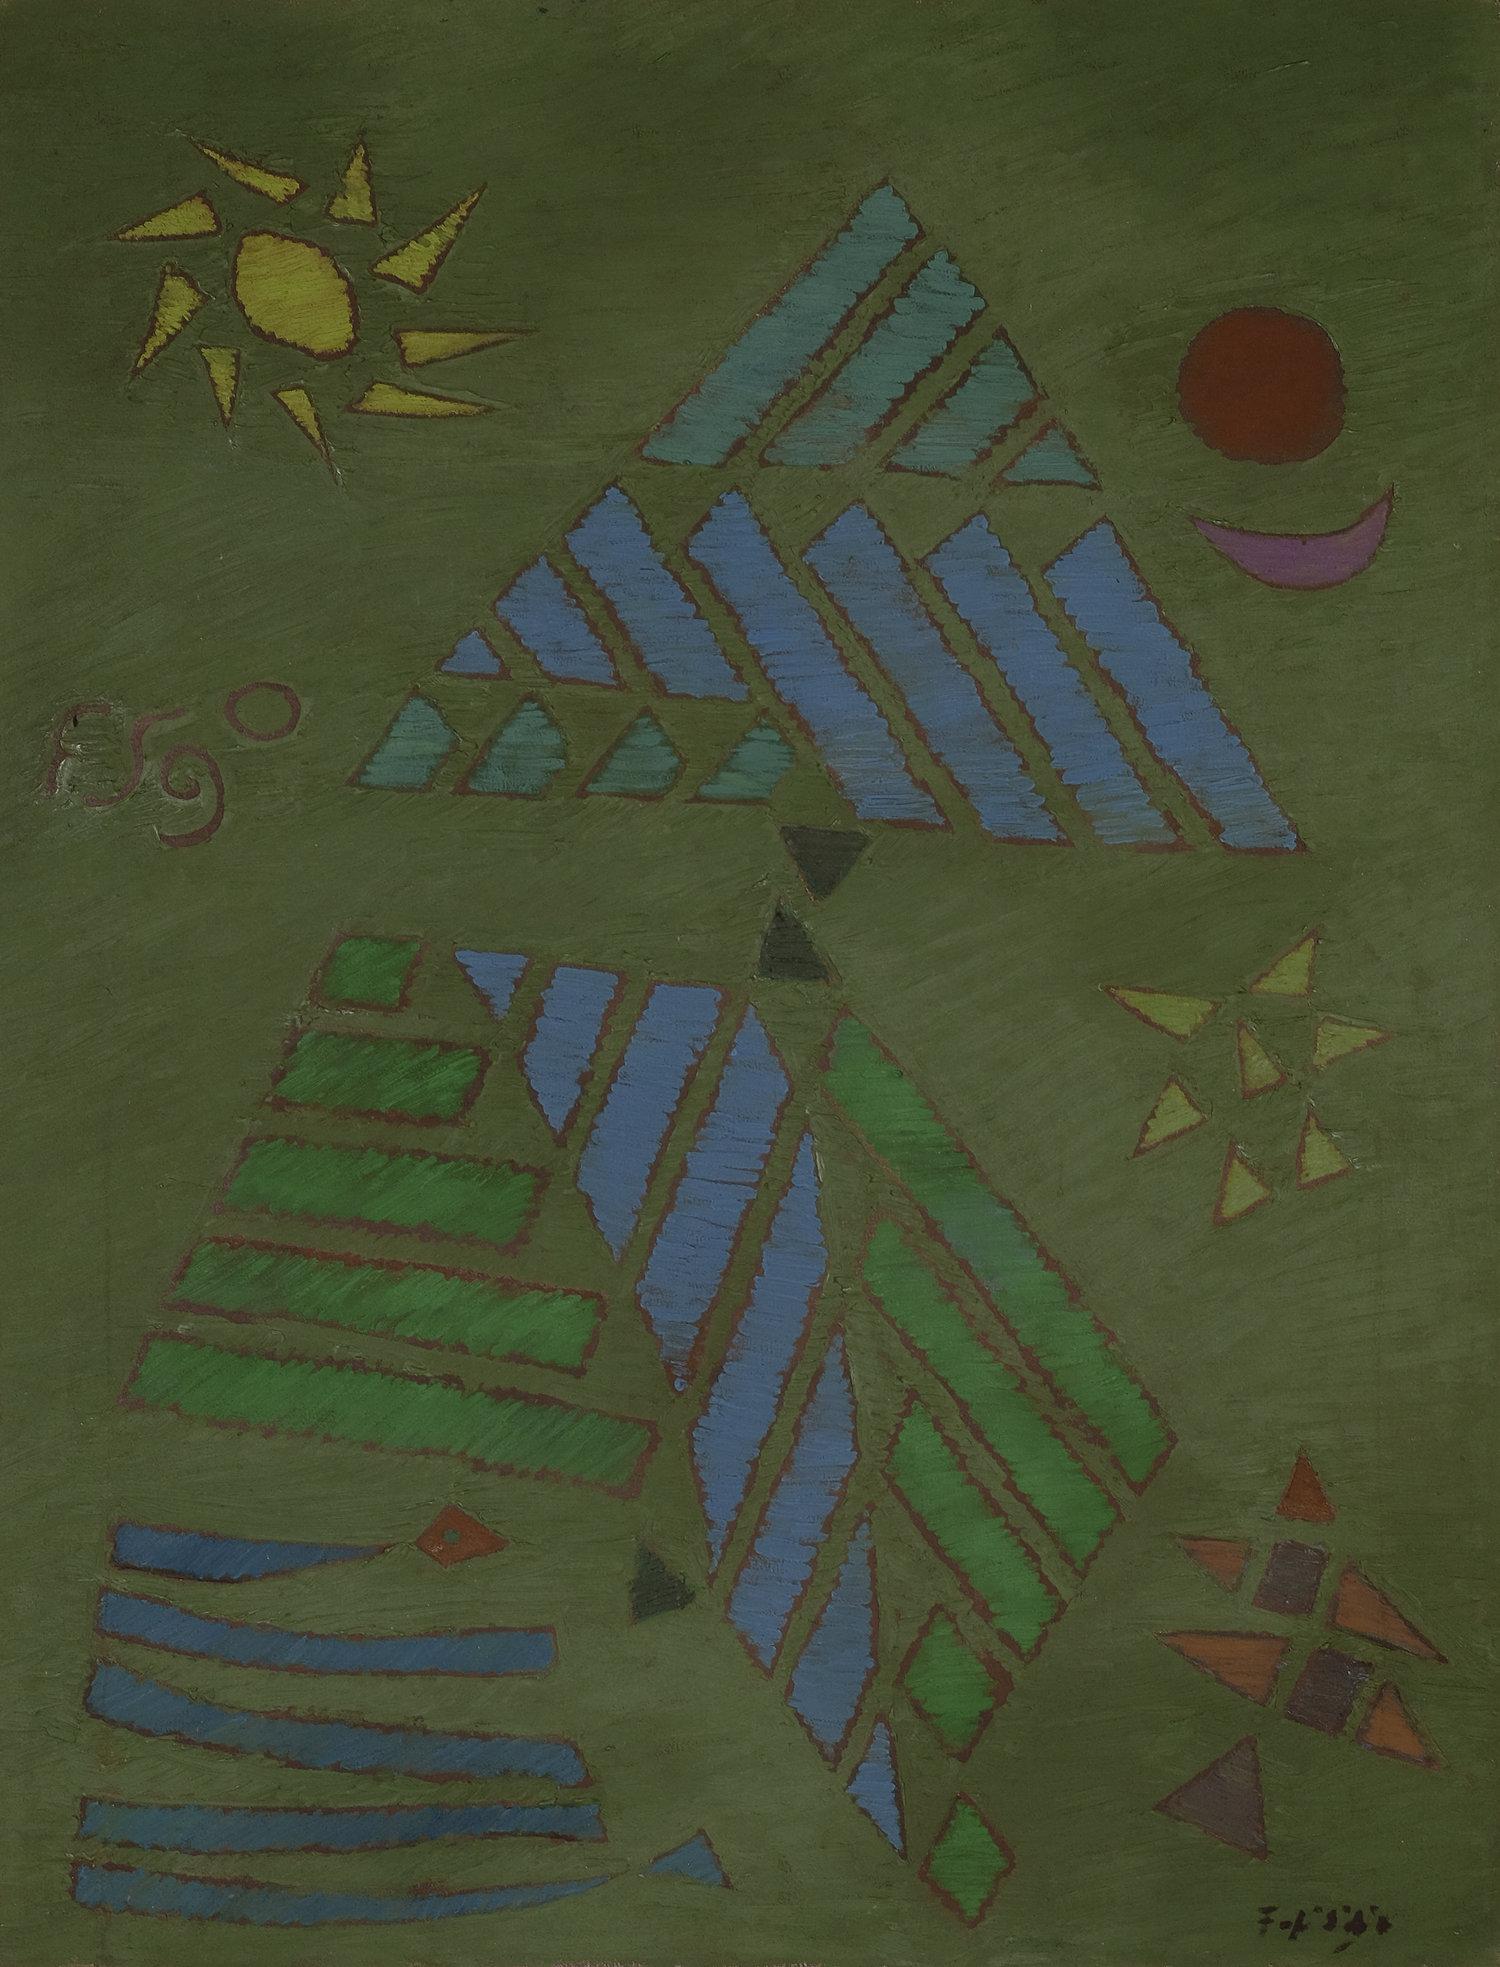 Fadjar Sidik, Abstraksi Matahari, Bulan dan Bintang (Sun, Moon and Star Abstraction), oil on canvas, 90 x 70 cm, 1971